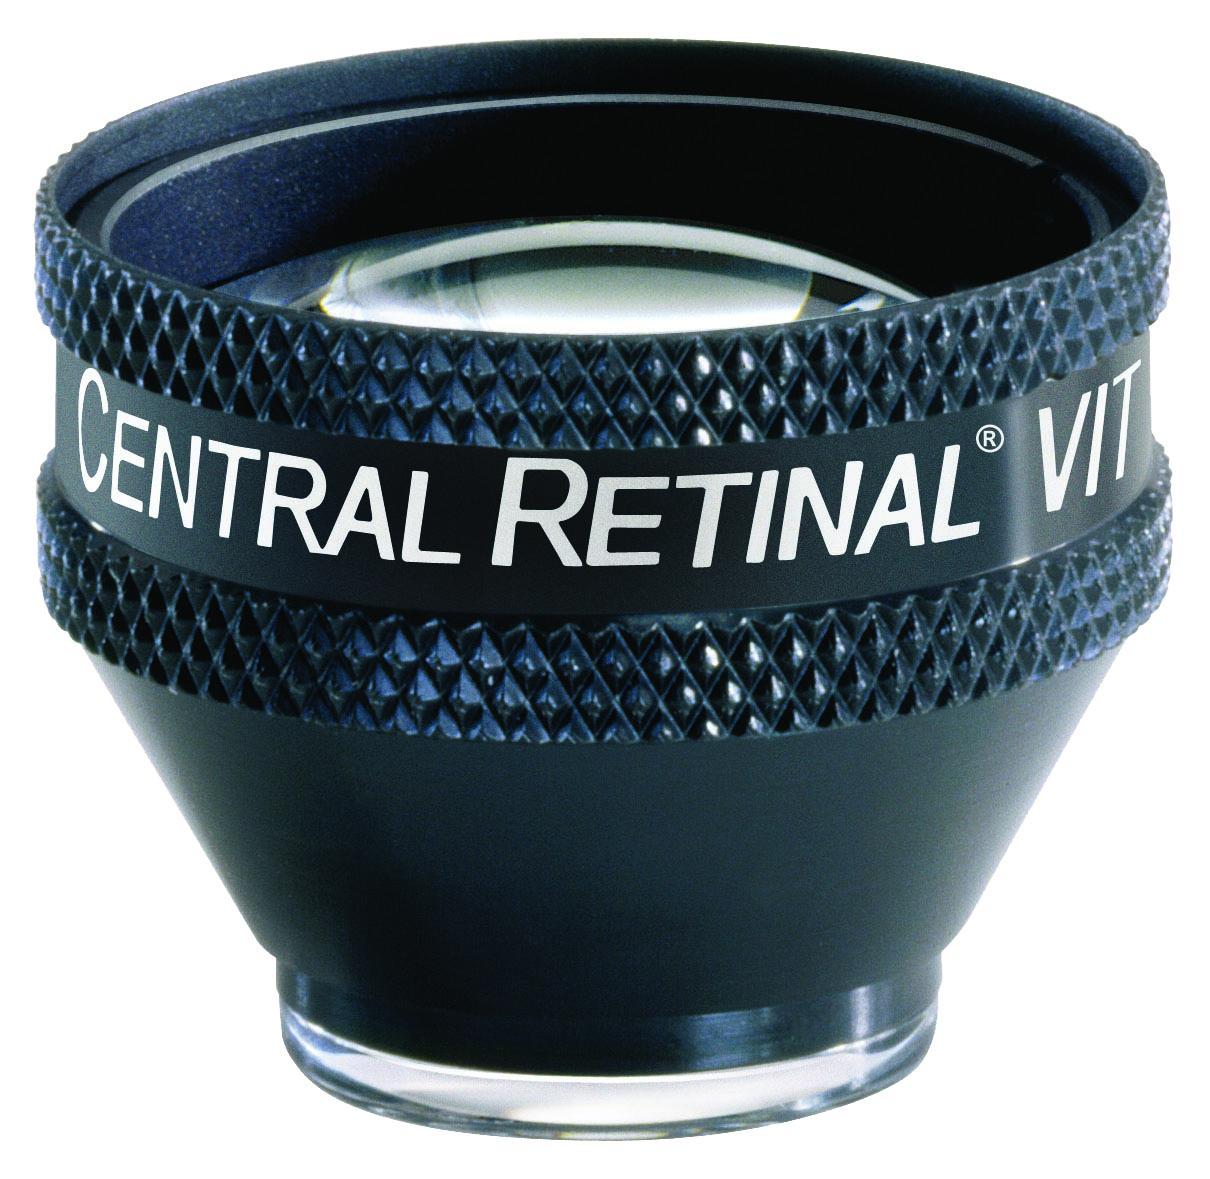 Central Retinal